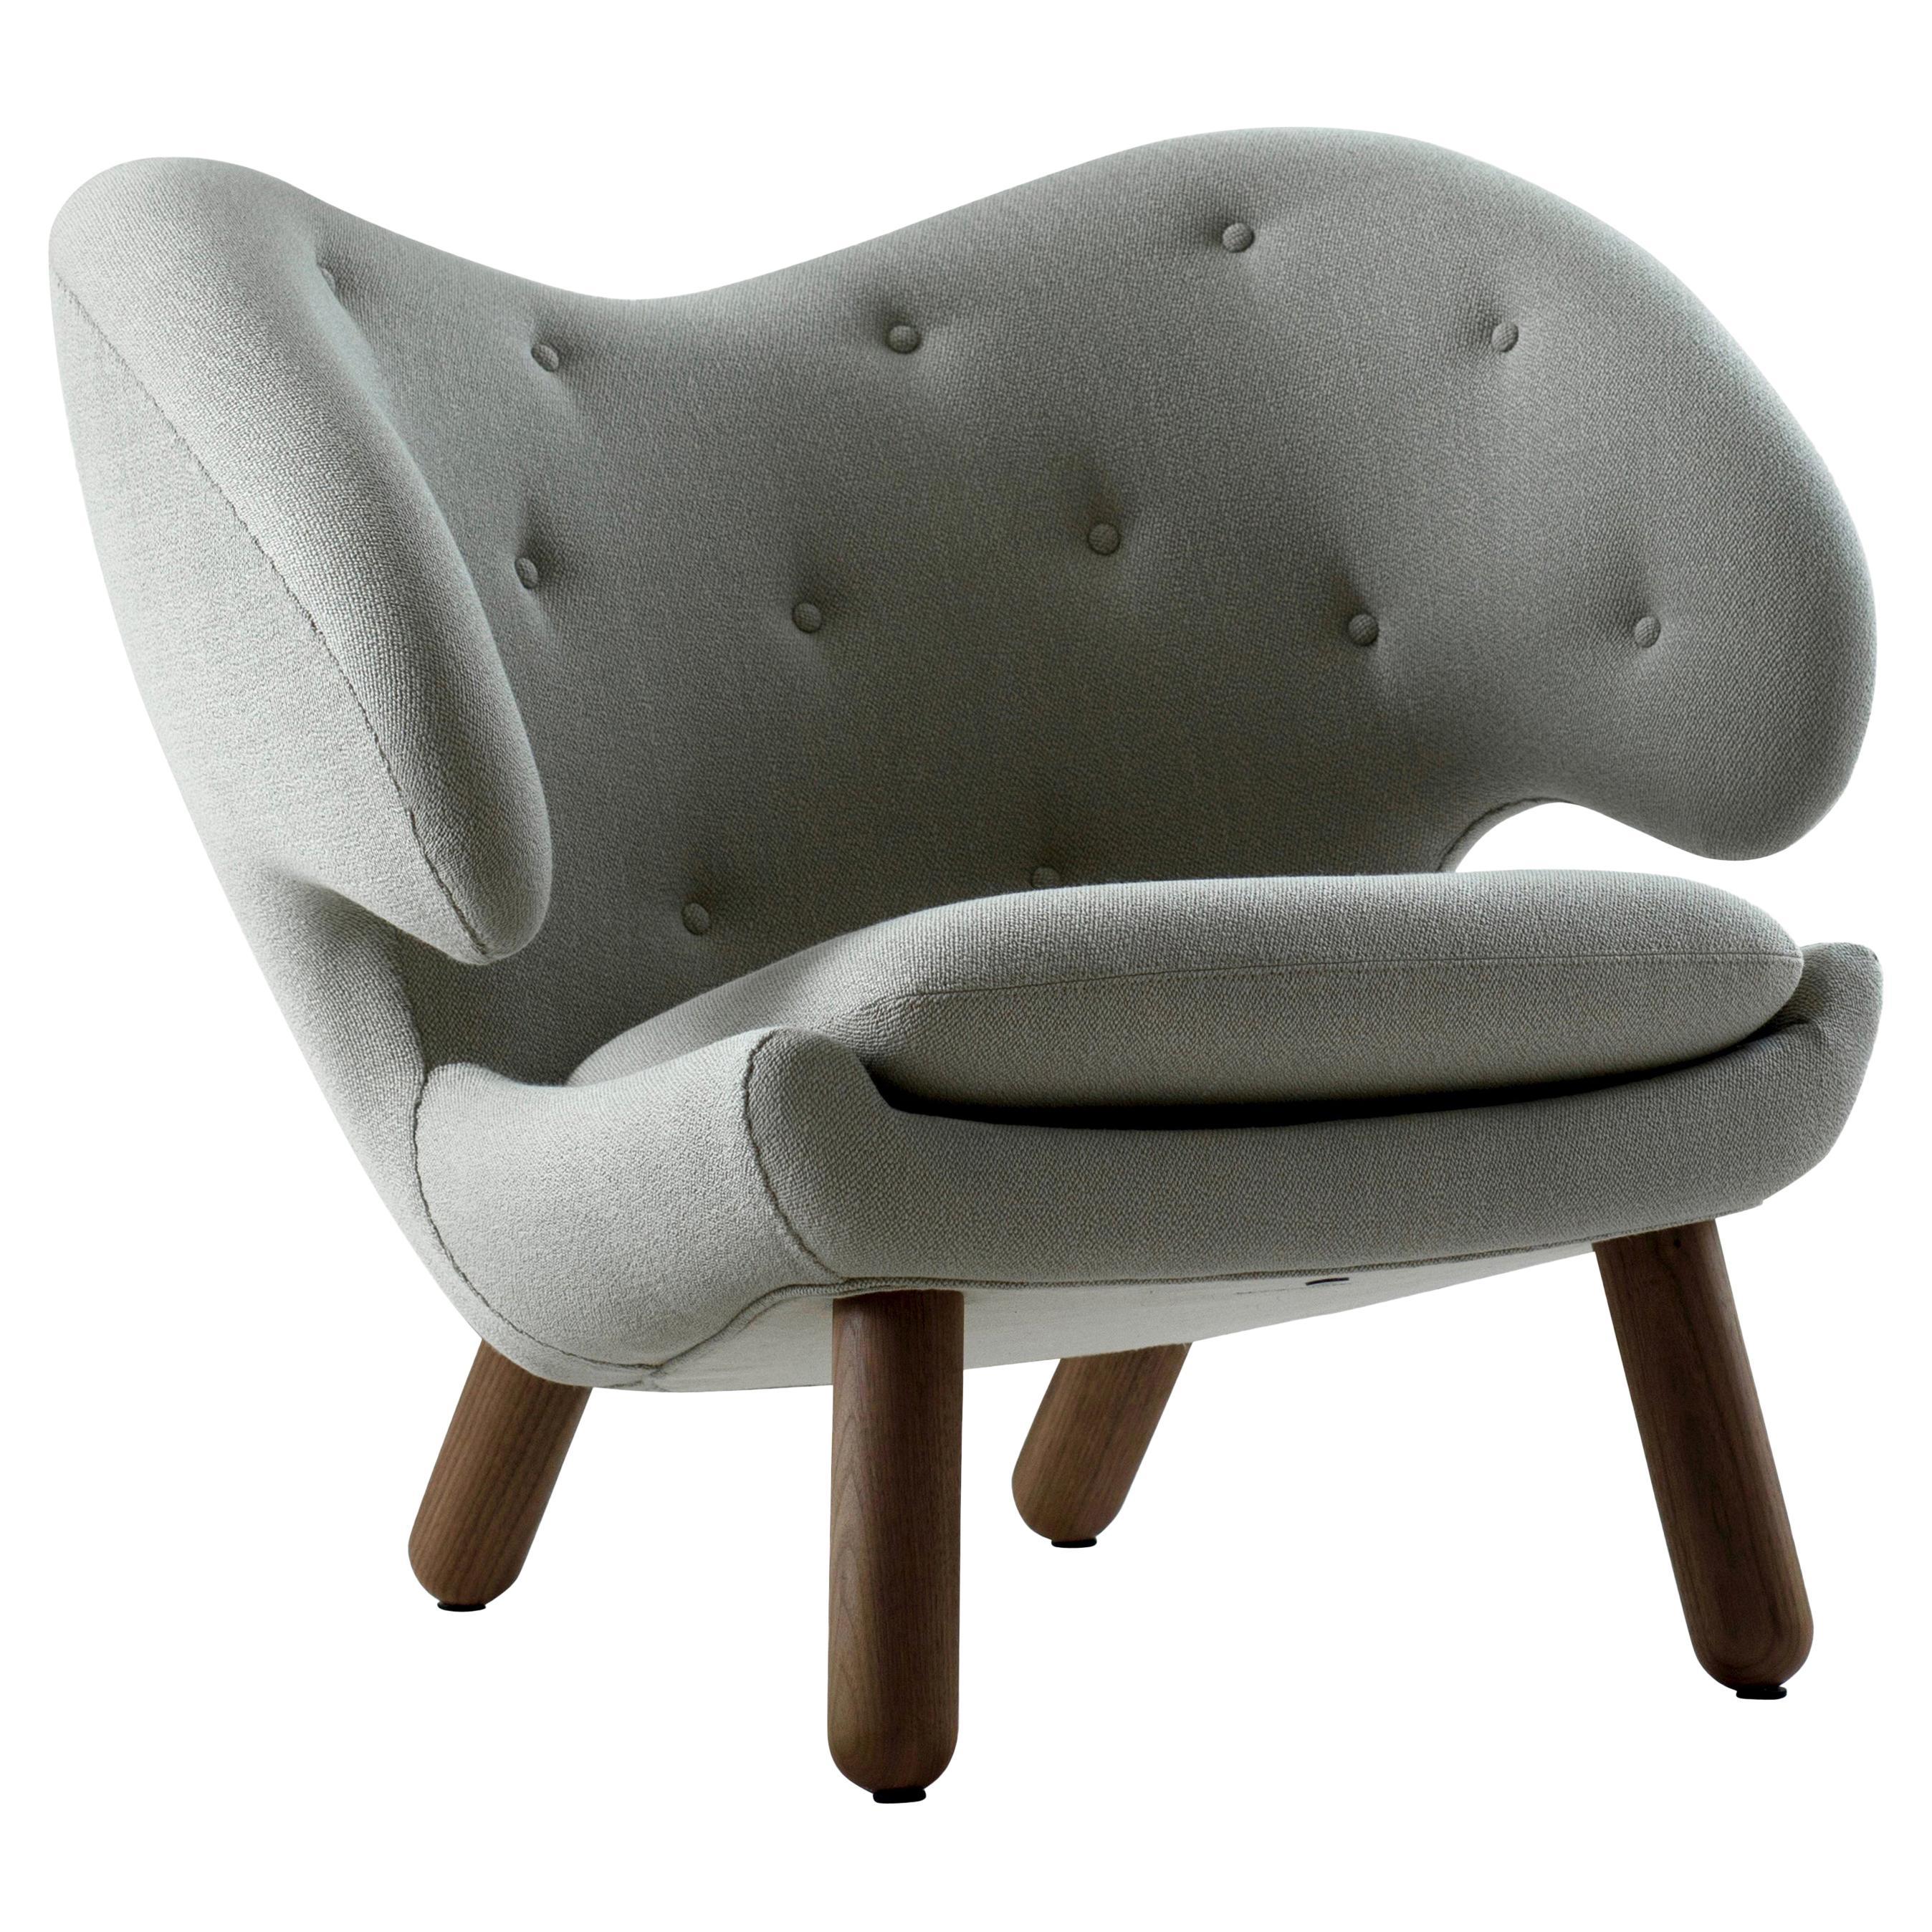 Finn Juhl Pelican Chair, Wood and Fabric